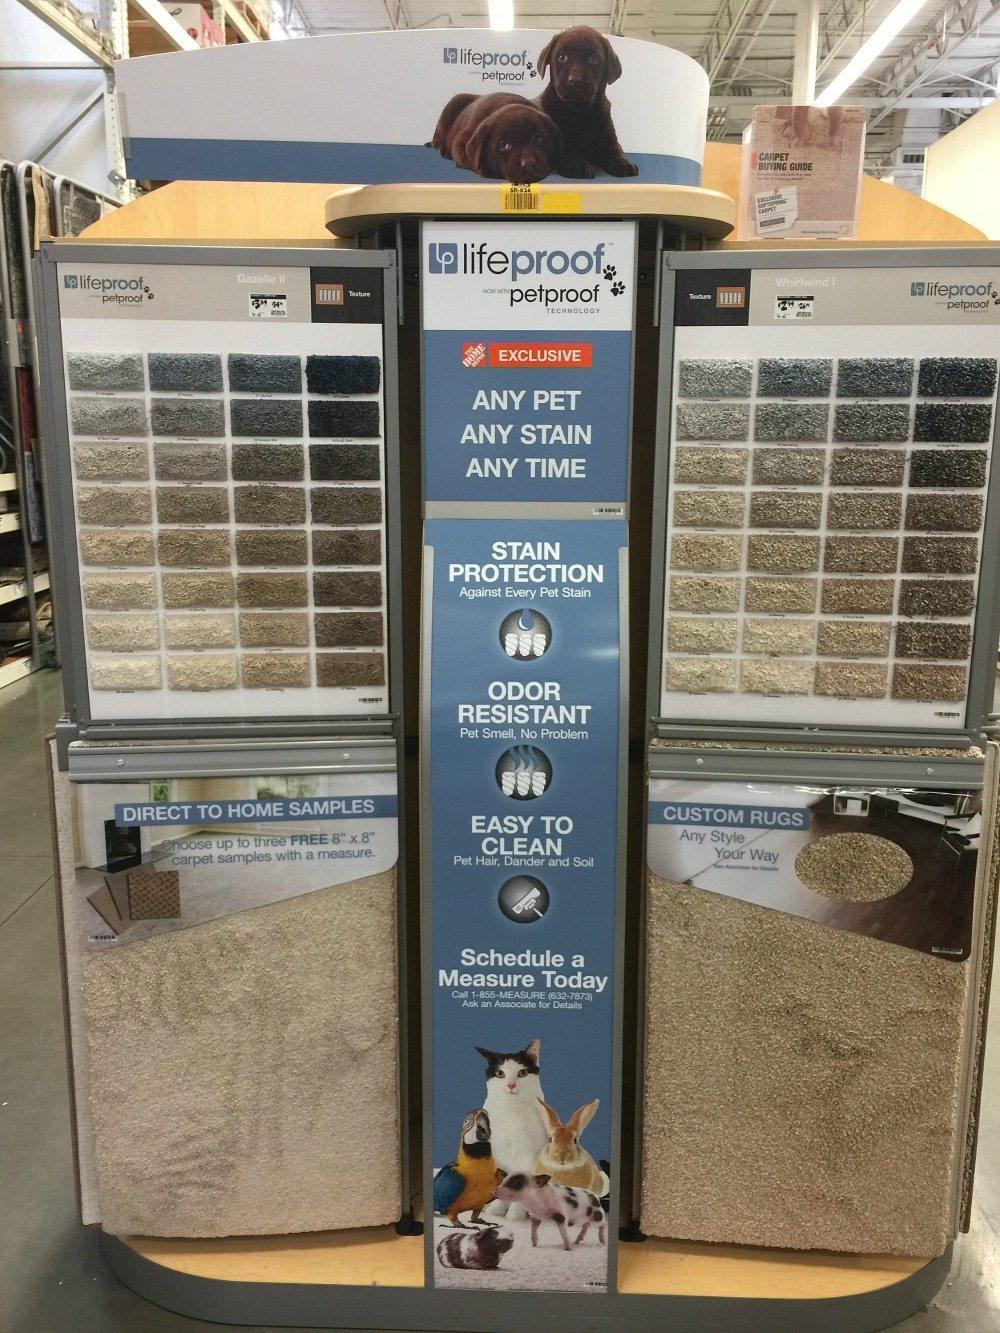 Favorite LifeProof Pet Proof Carpet